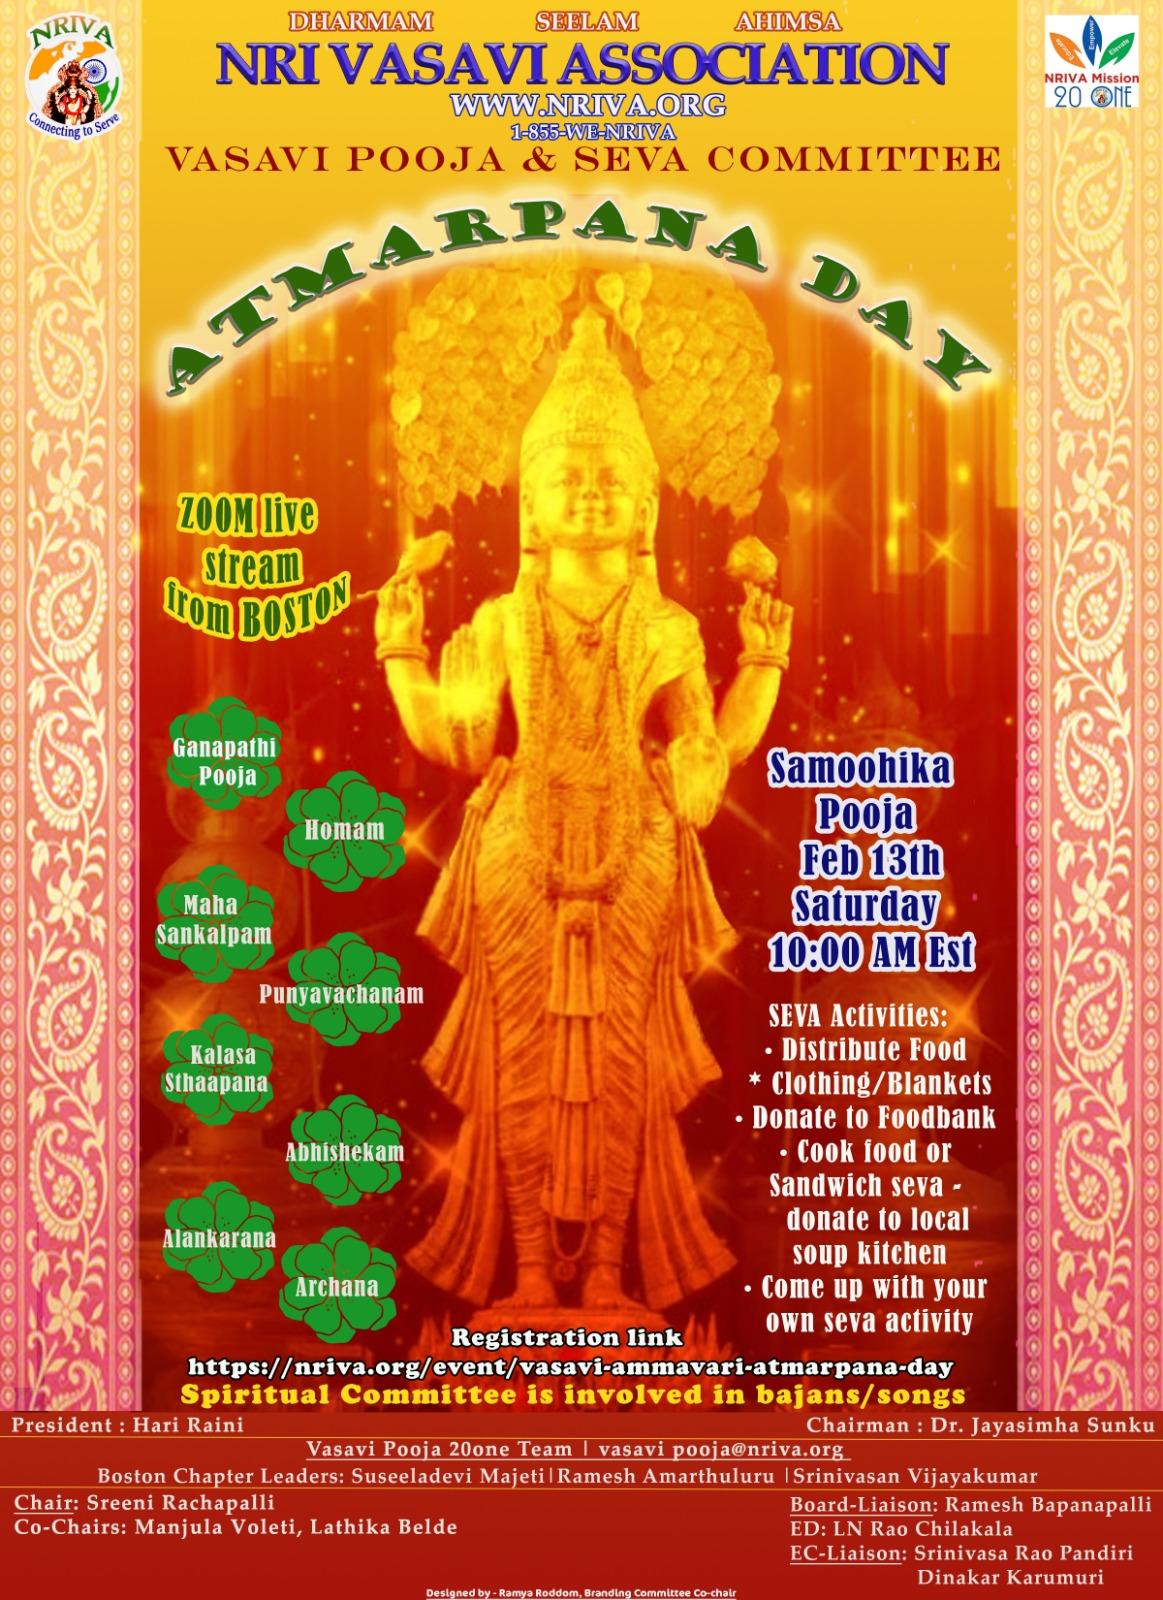 NRIVA Vasavi Ammavari Atmarpana Day